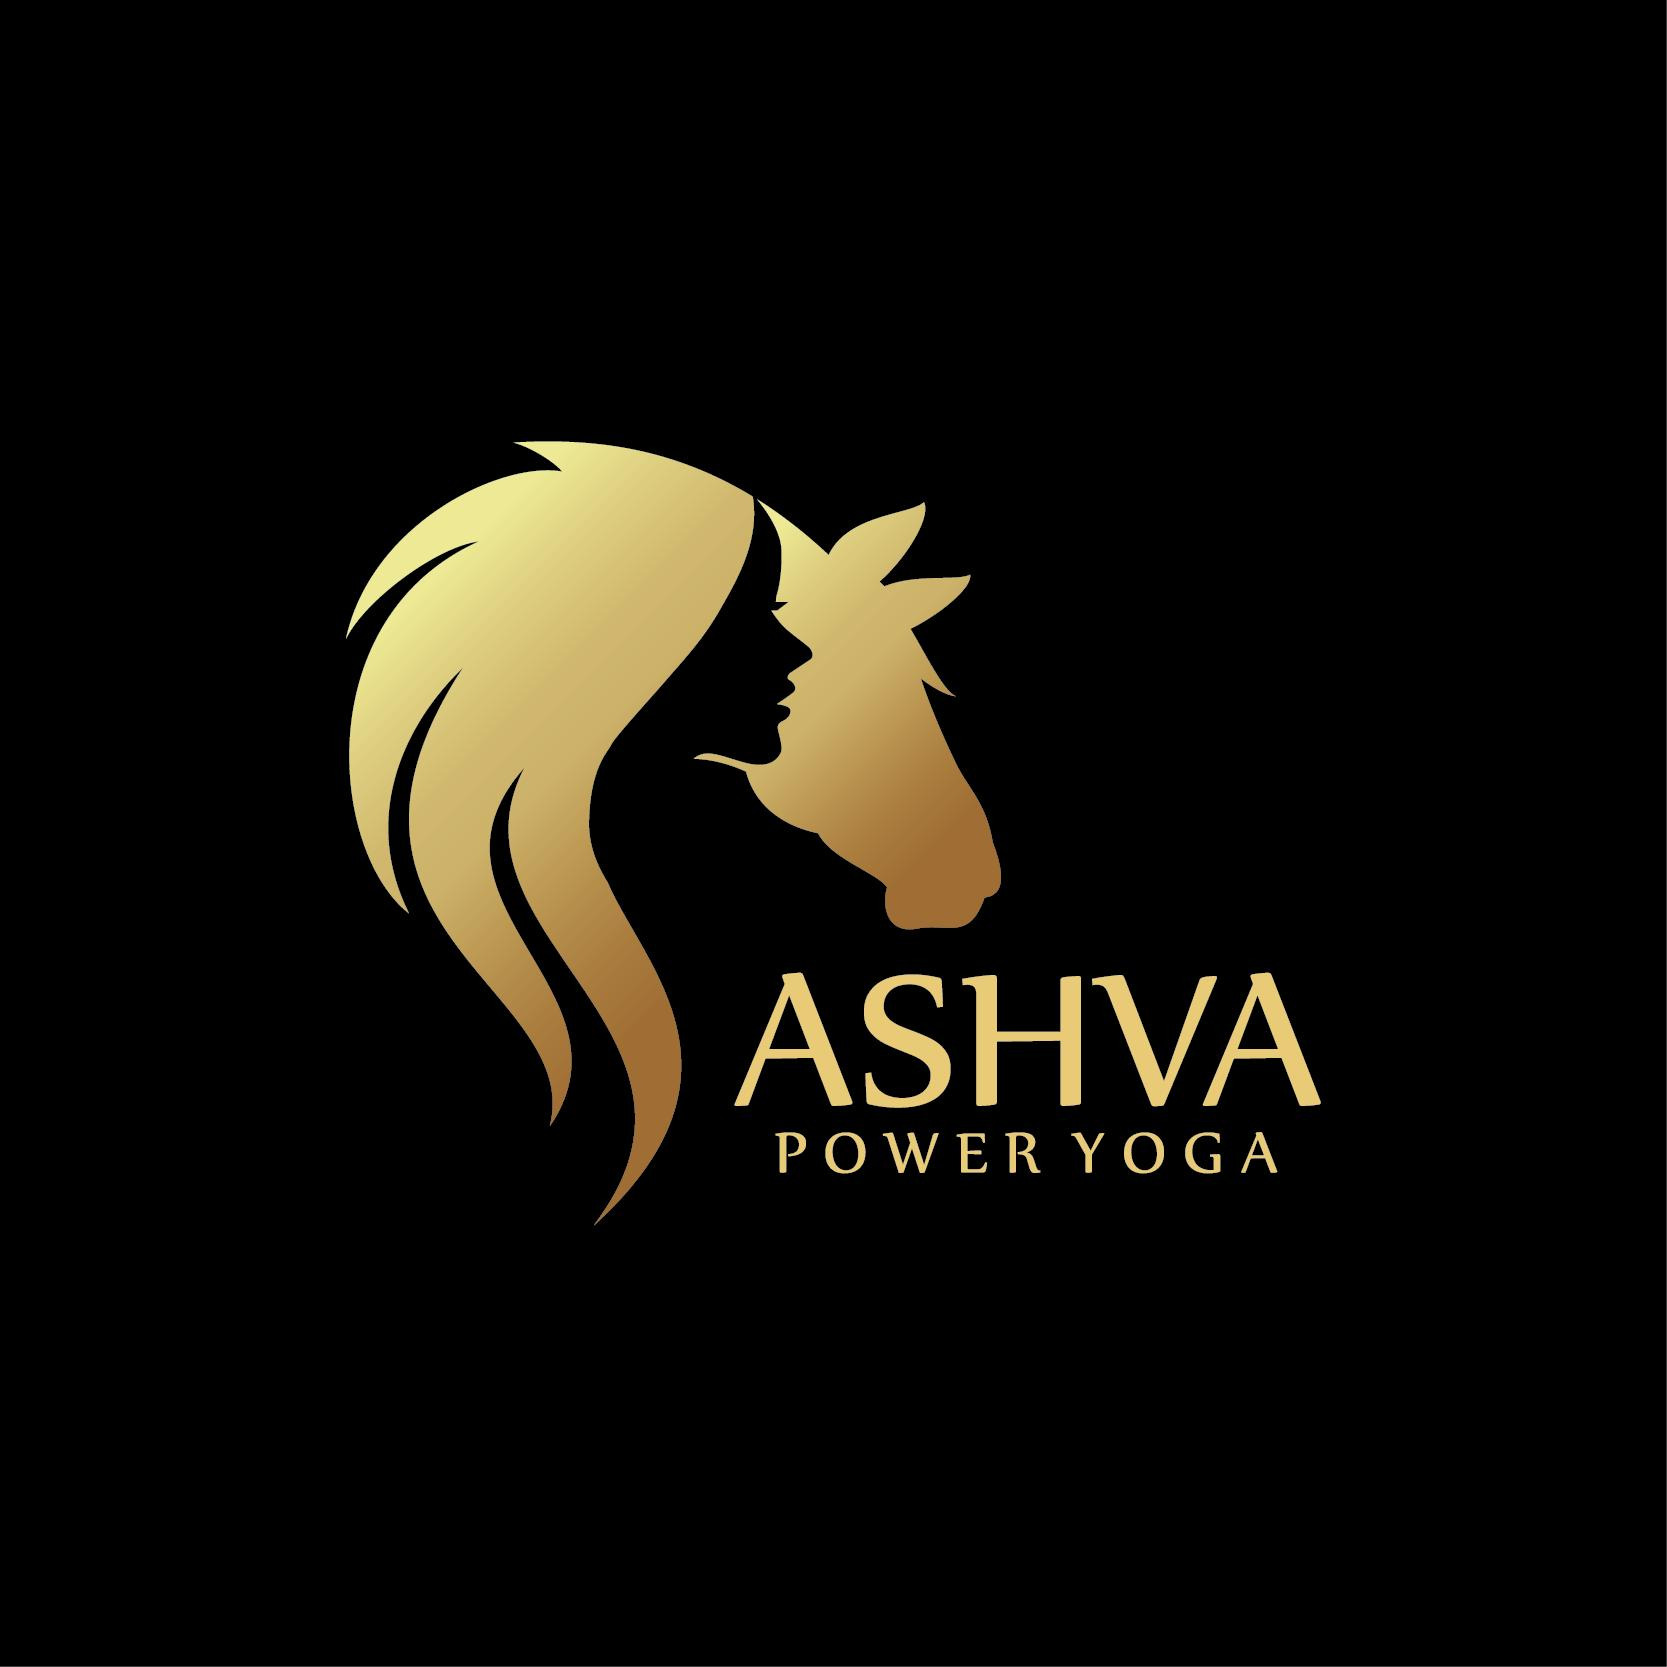 ashva logo jpg